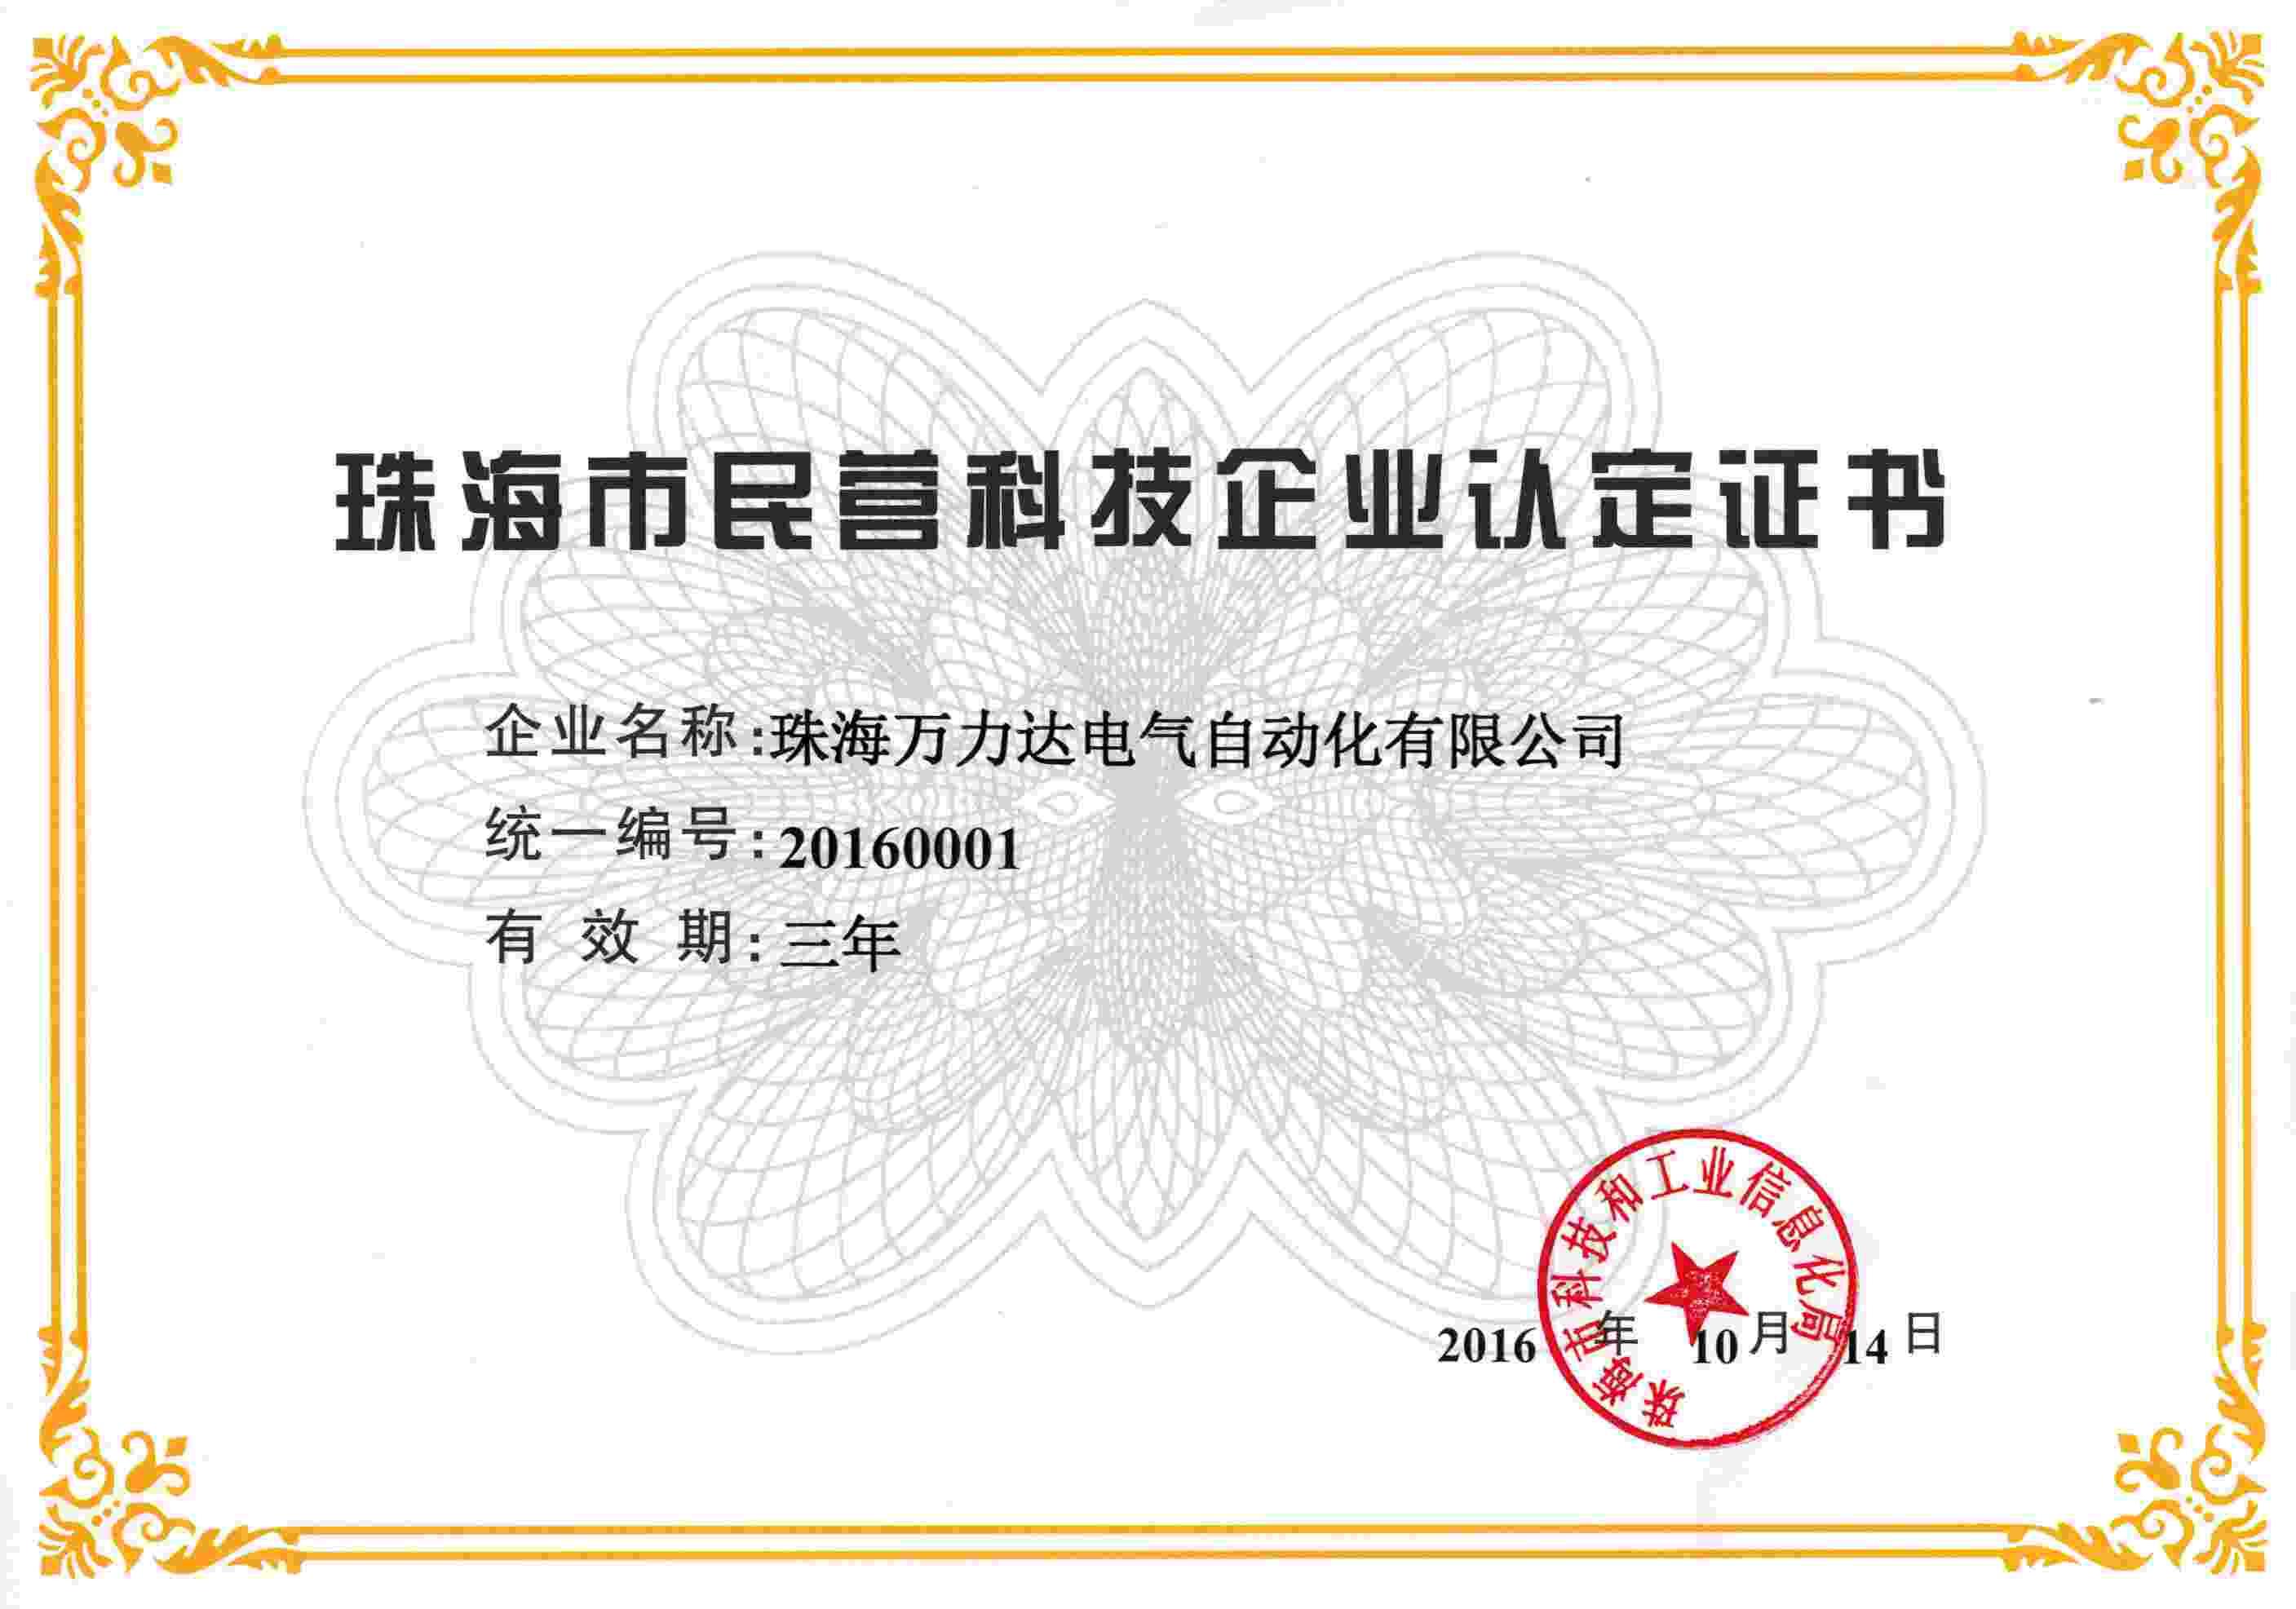 <span>民营科技企业证书</span>